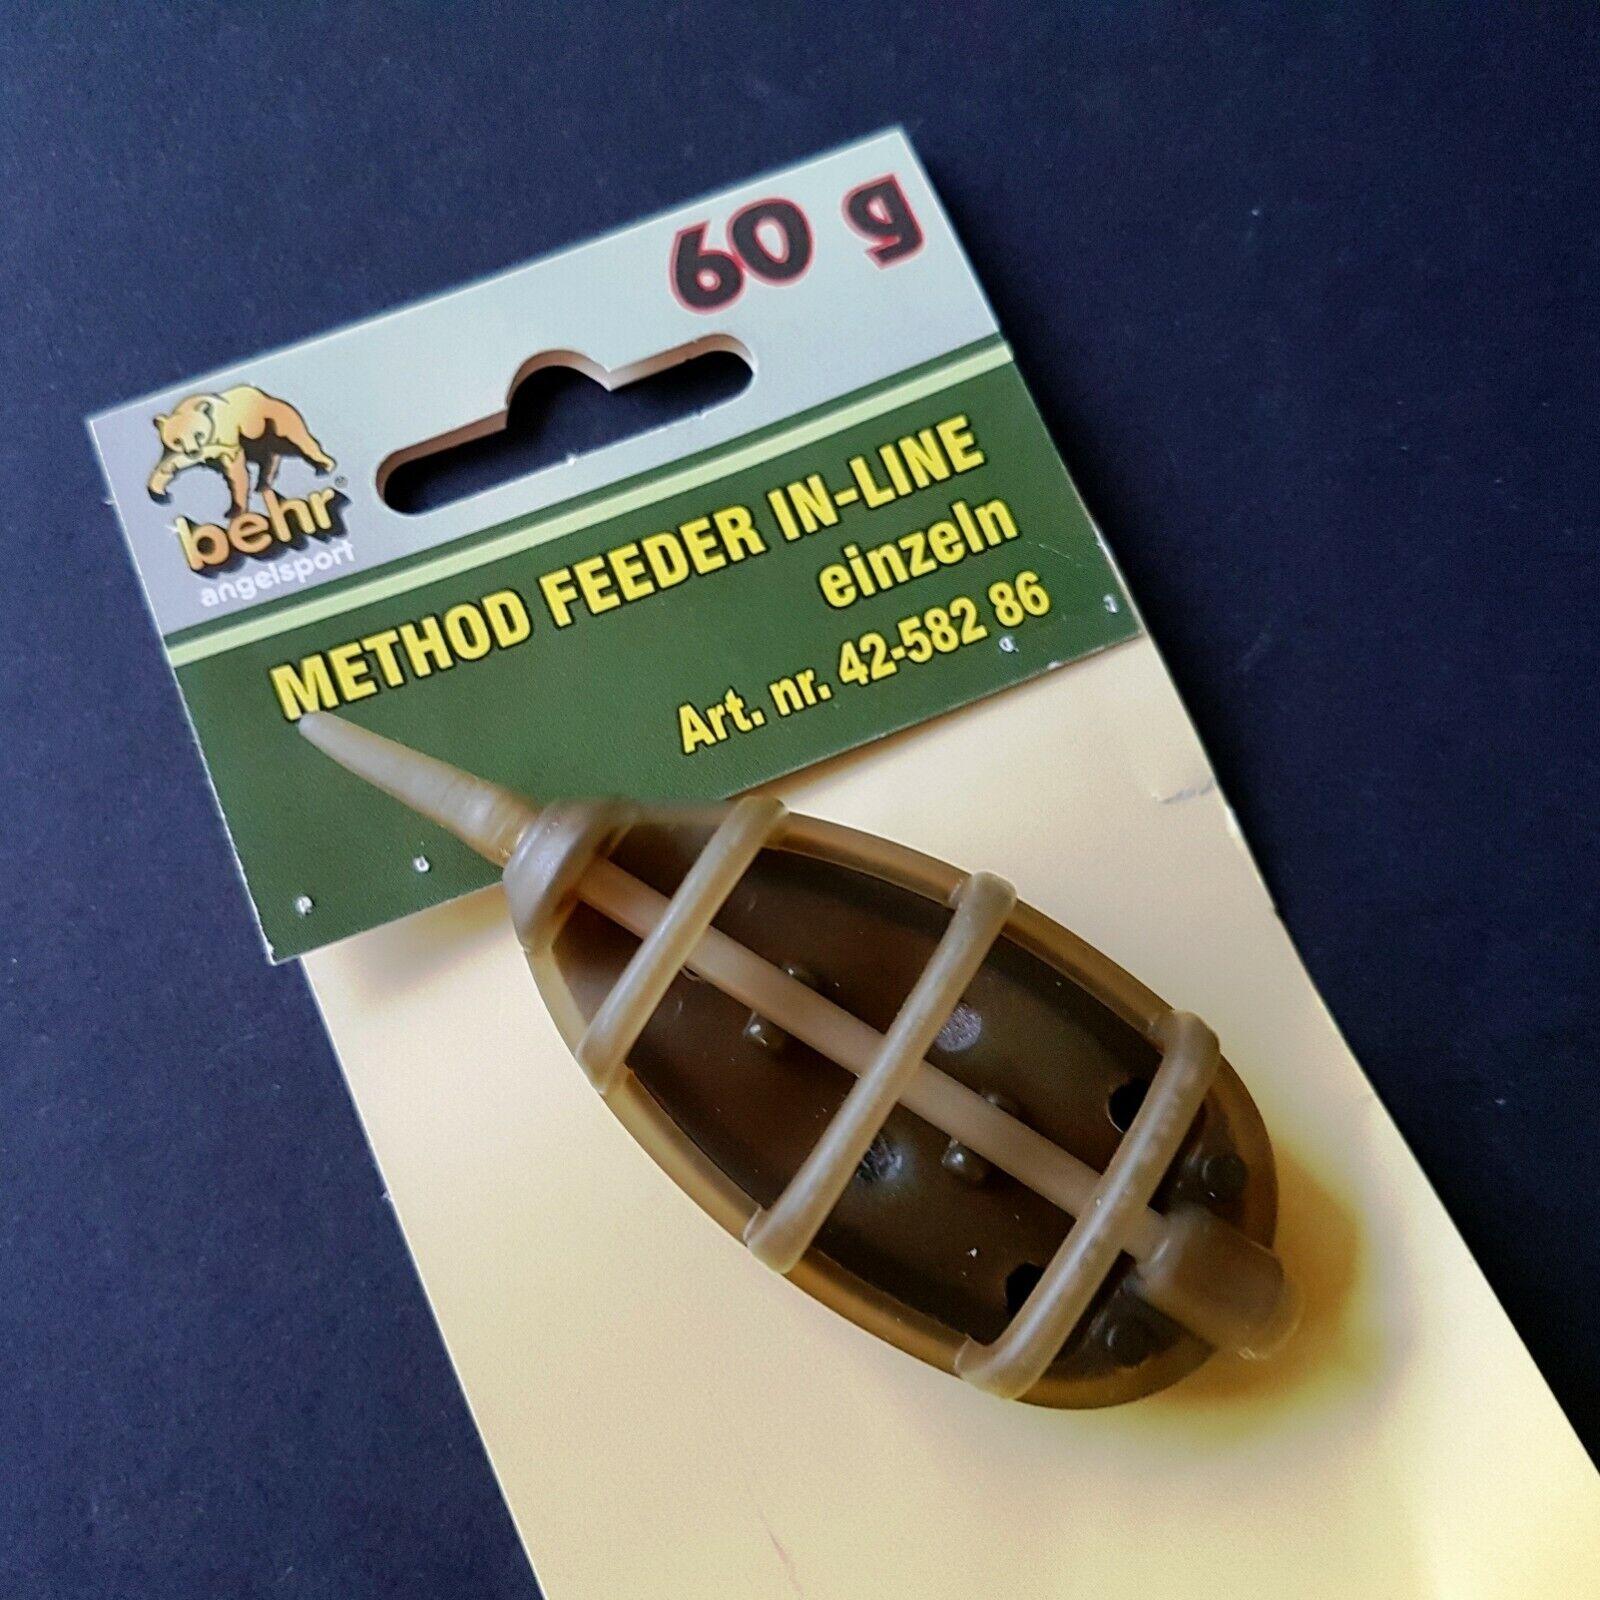 Browning Hydrus Method Feeder Futterkorb Futterkörbe Feedern